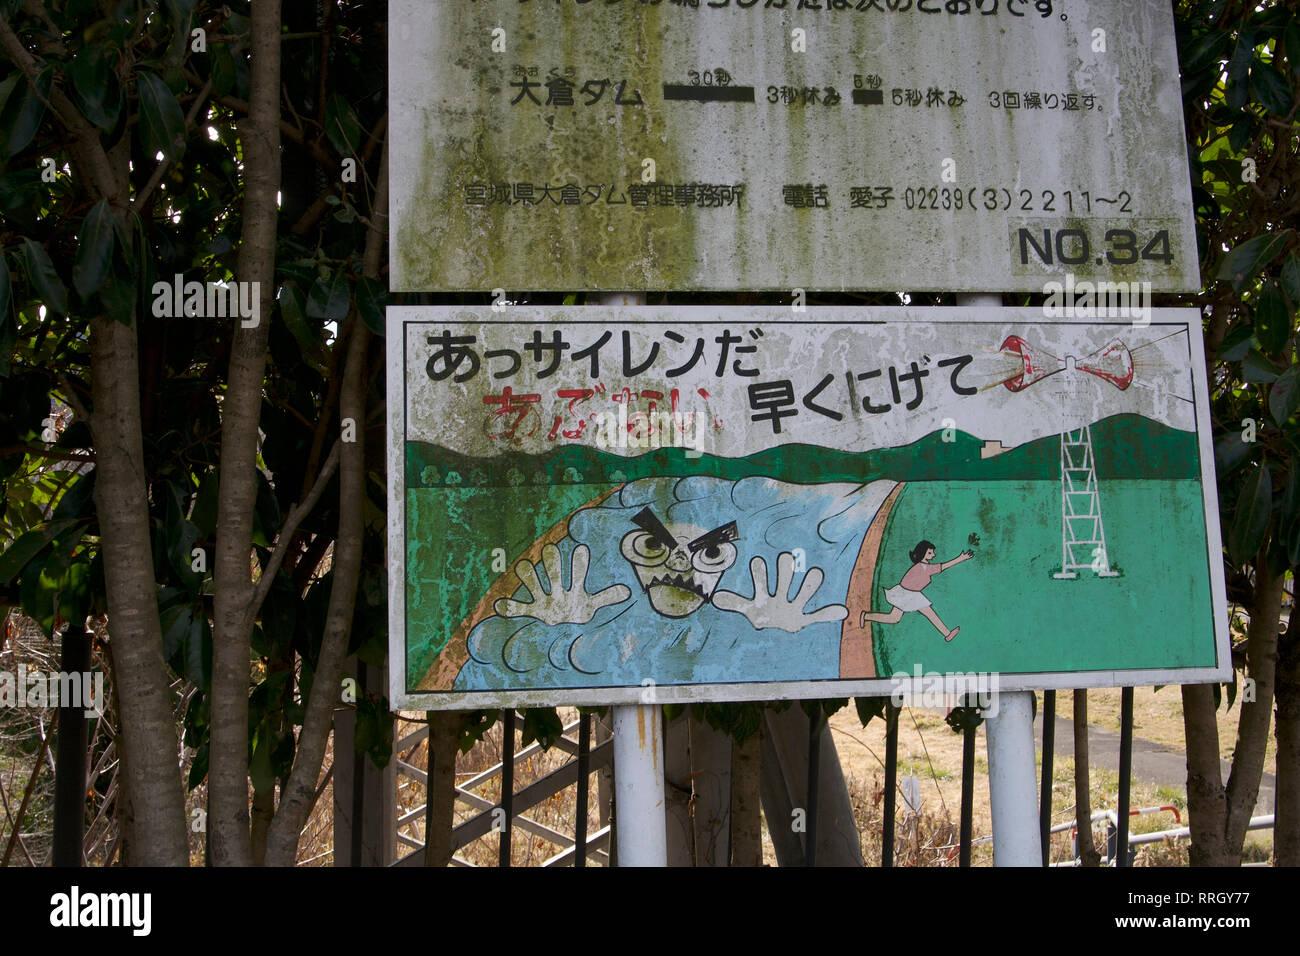 Sendai-Tsunami warning near the site of Katakura Kojuro's residence Stock Photo